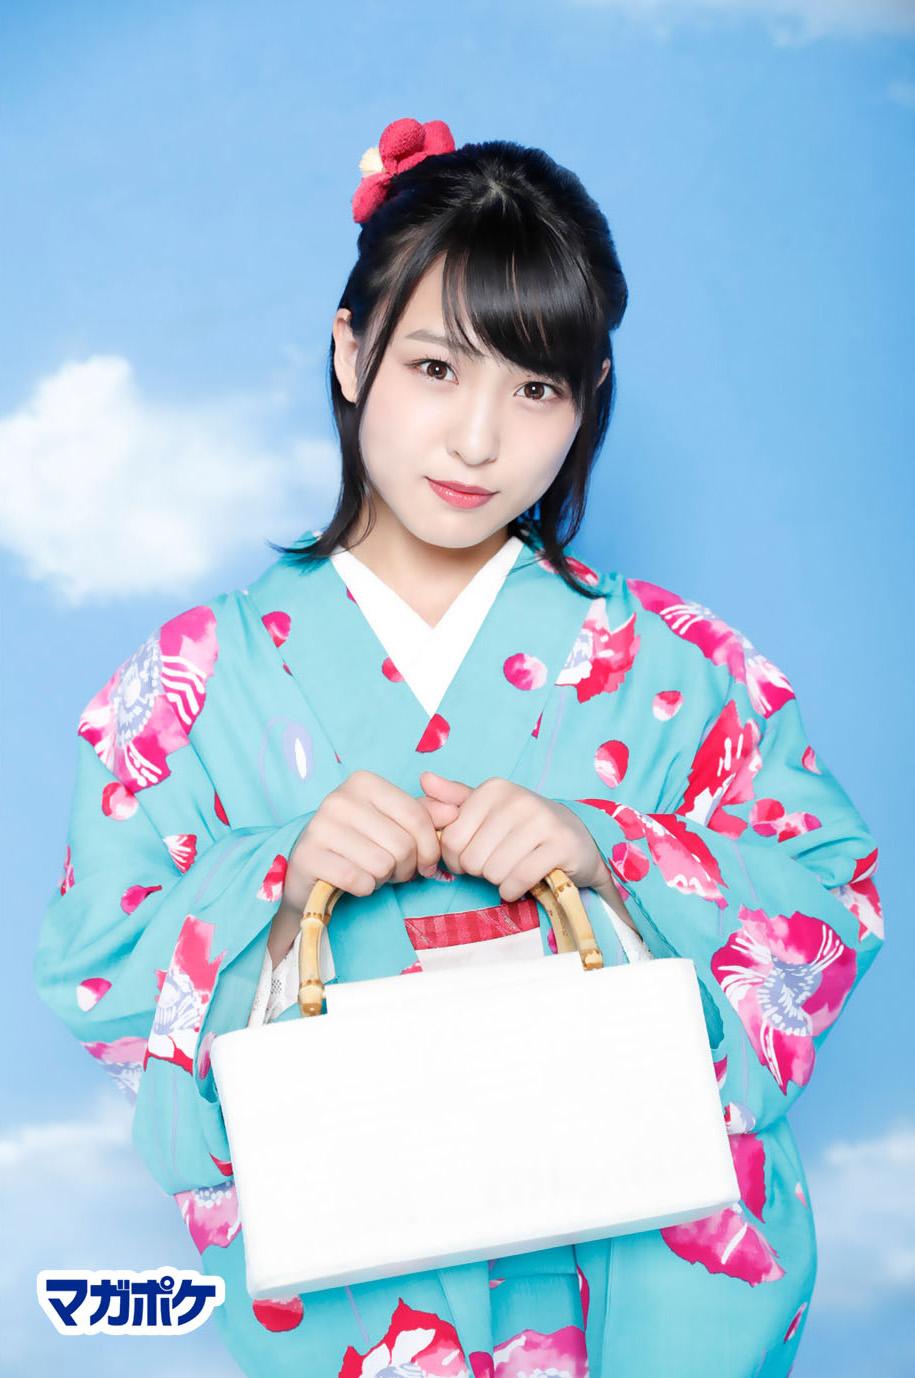 Yamada Nanami 山田菜々美, AKB48 Team8 x Weekly Maga Cover Competition